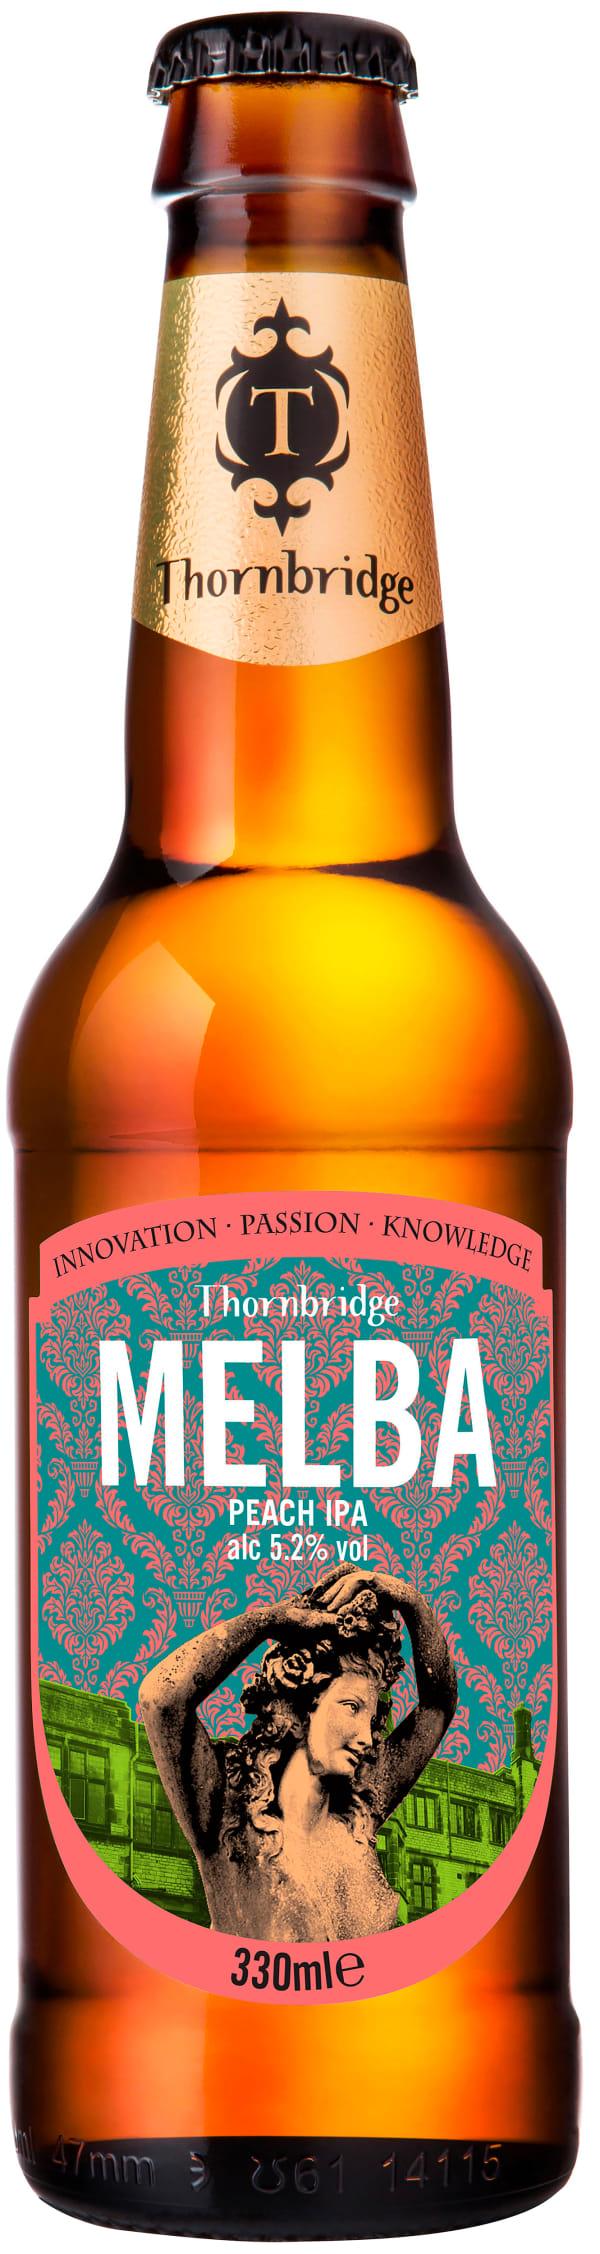 Thornbridge Melba Peach IPA